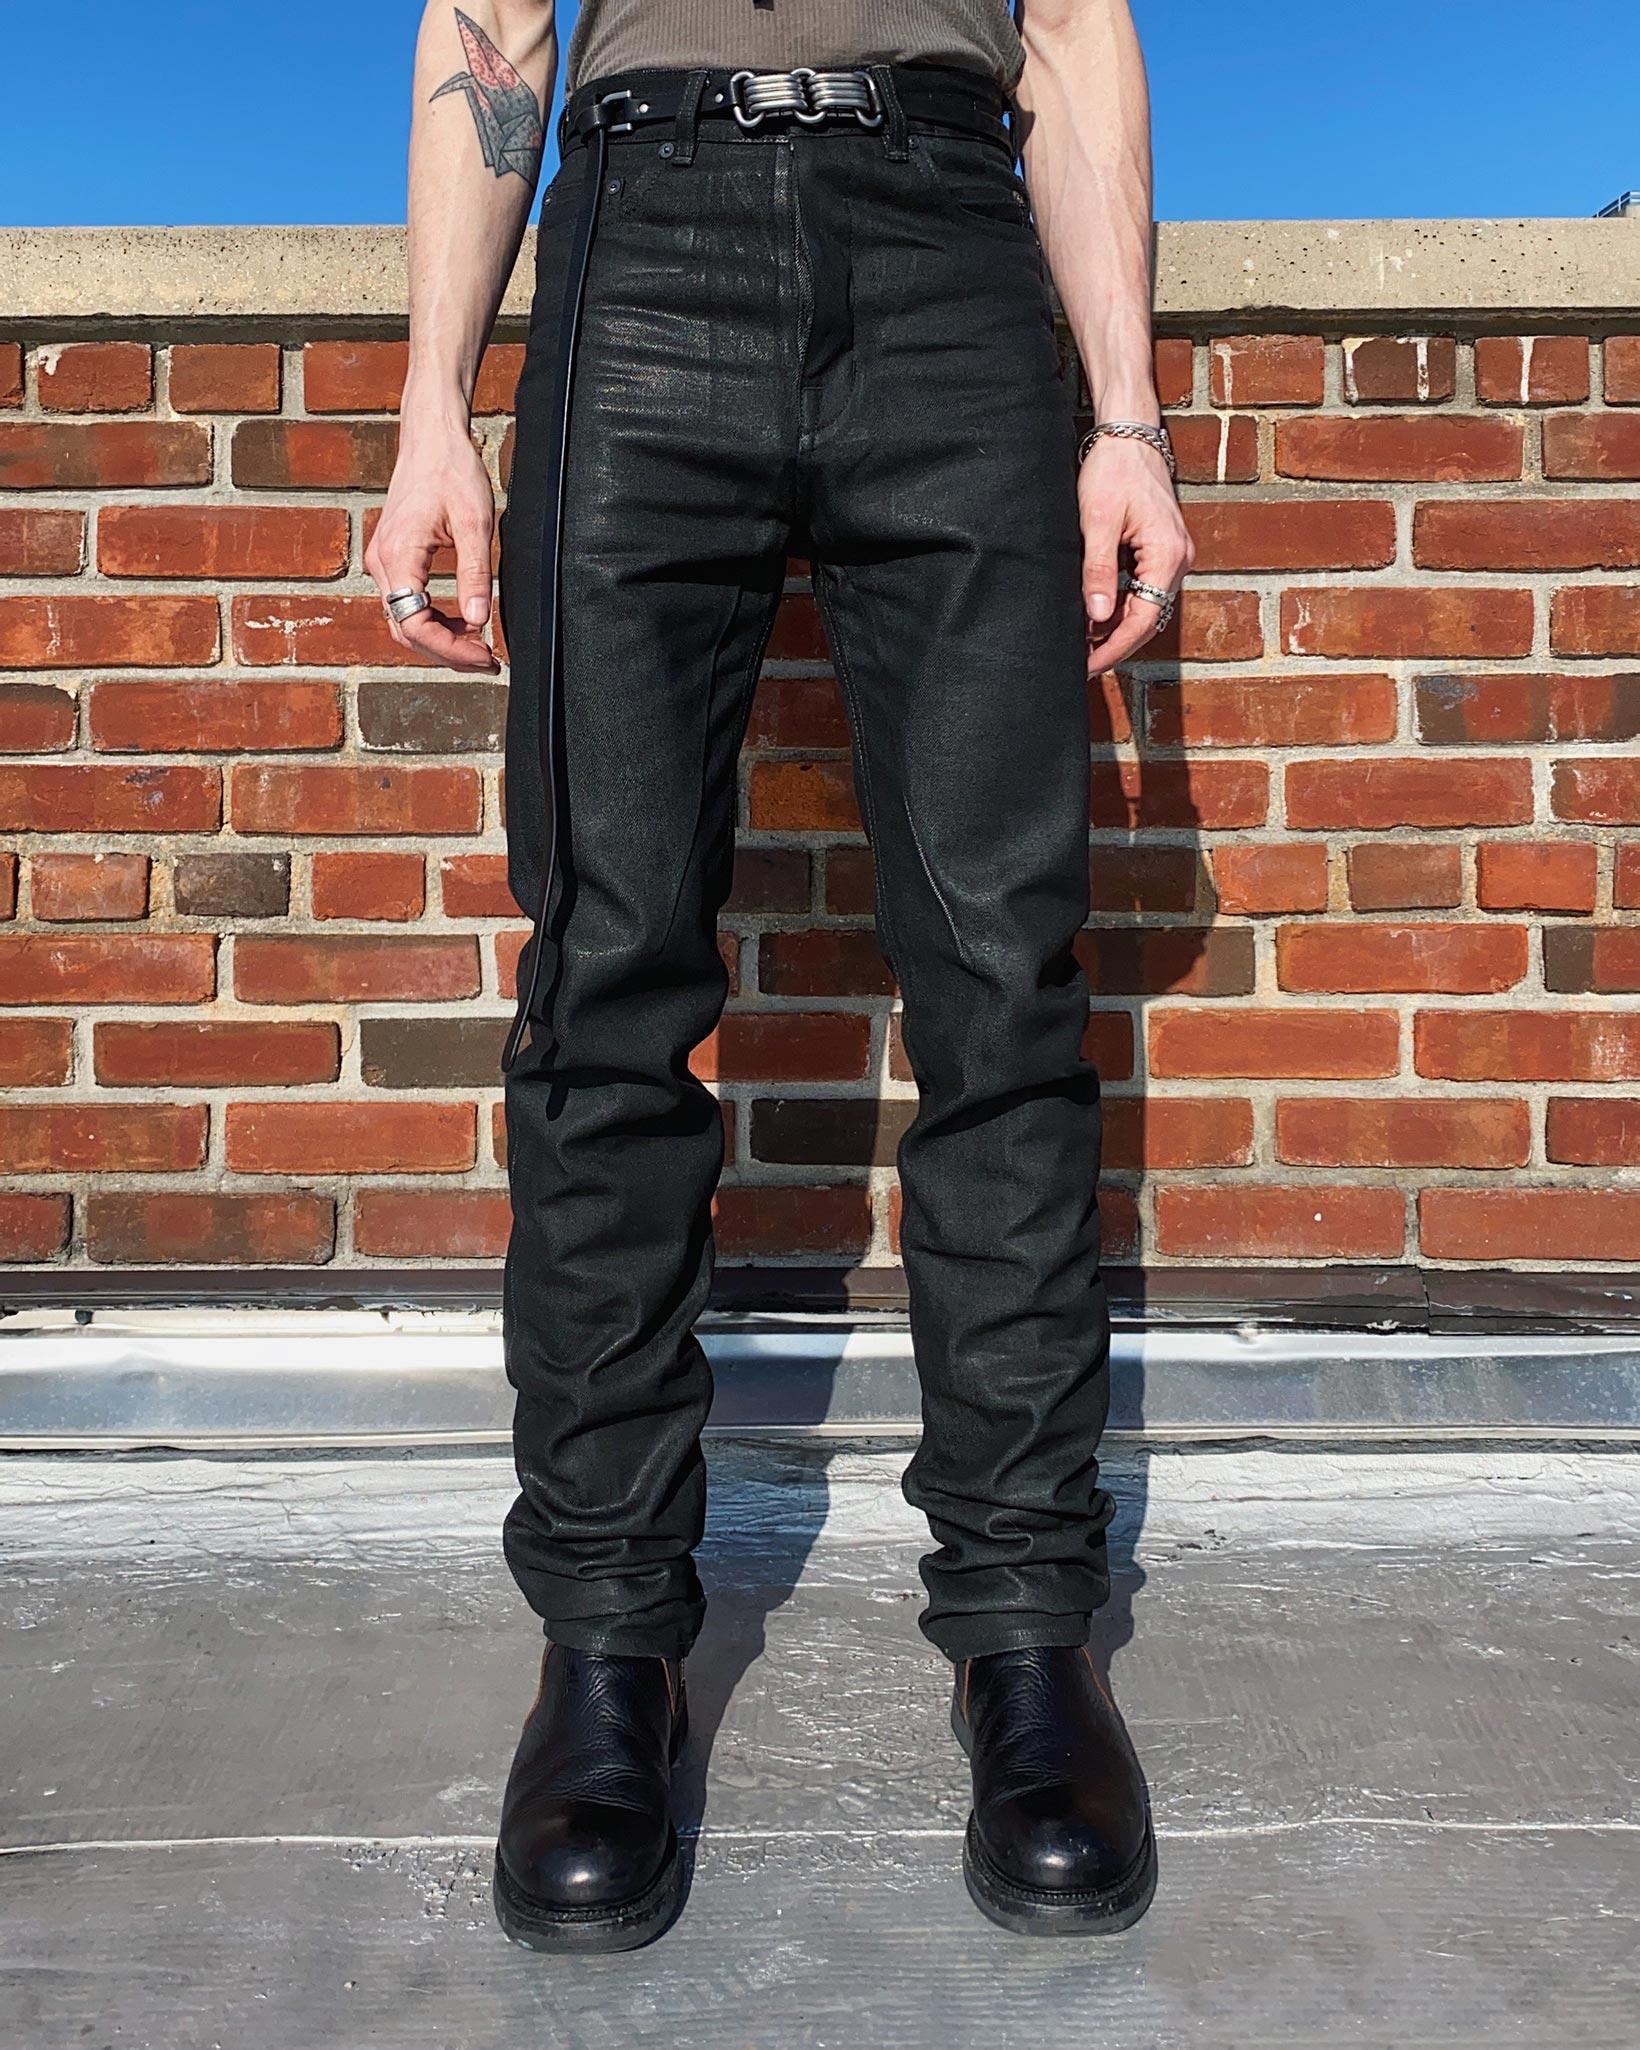 Rick Owens DRKSHDW Duke Jeans - Made in Japan Black Waxed (Self Edge Exclusive) - Image 26